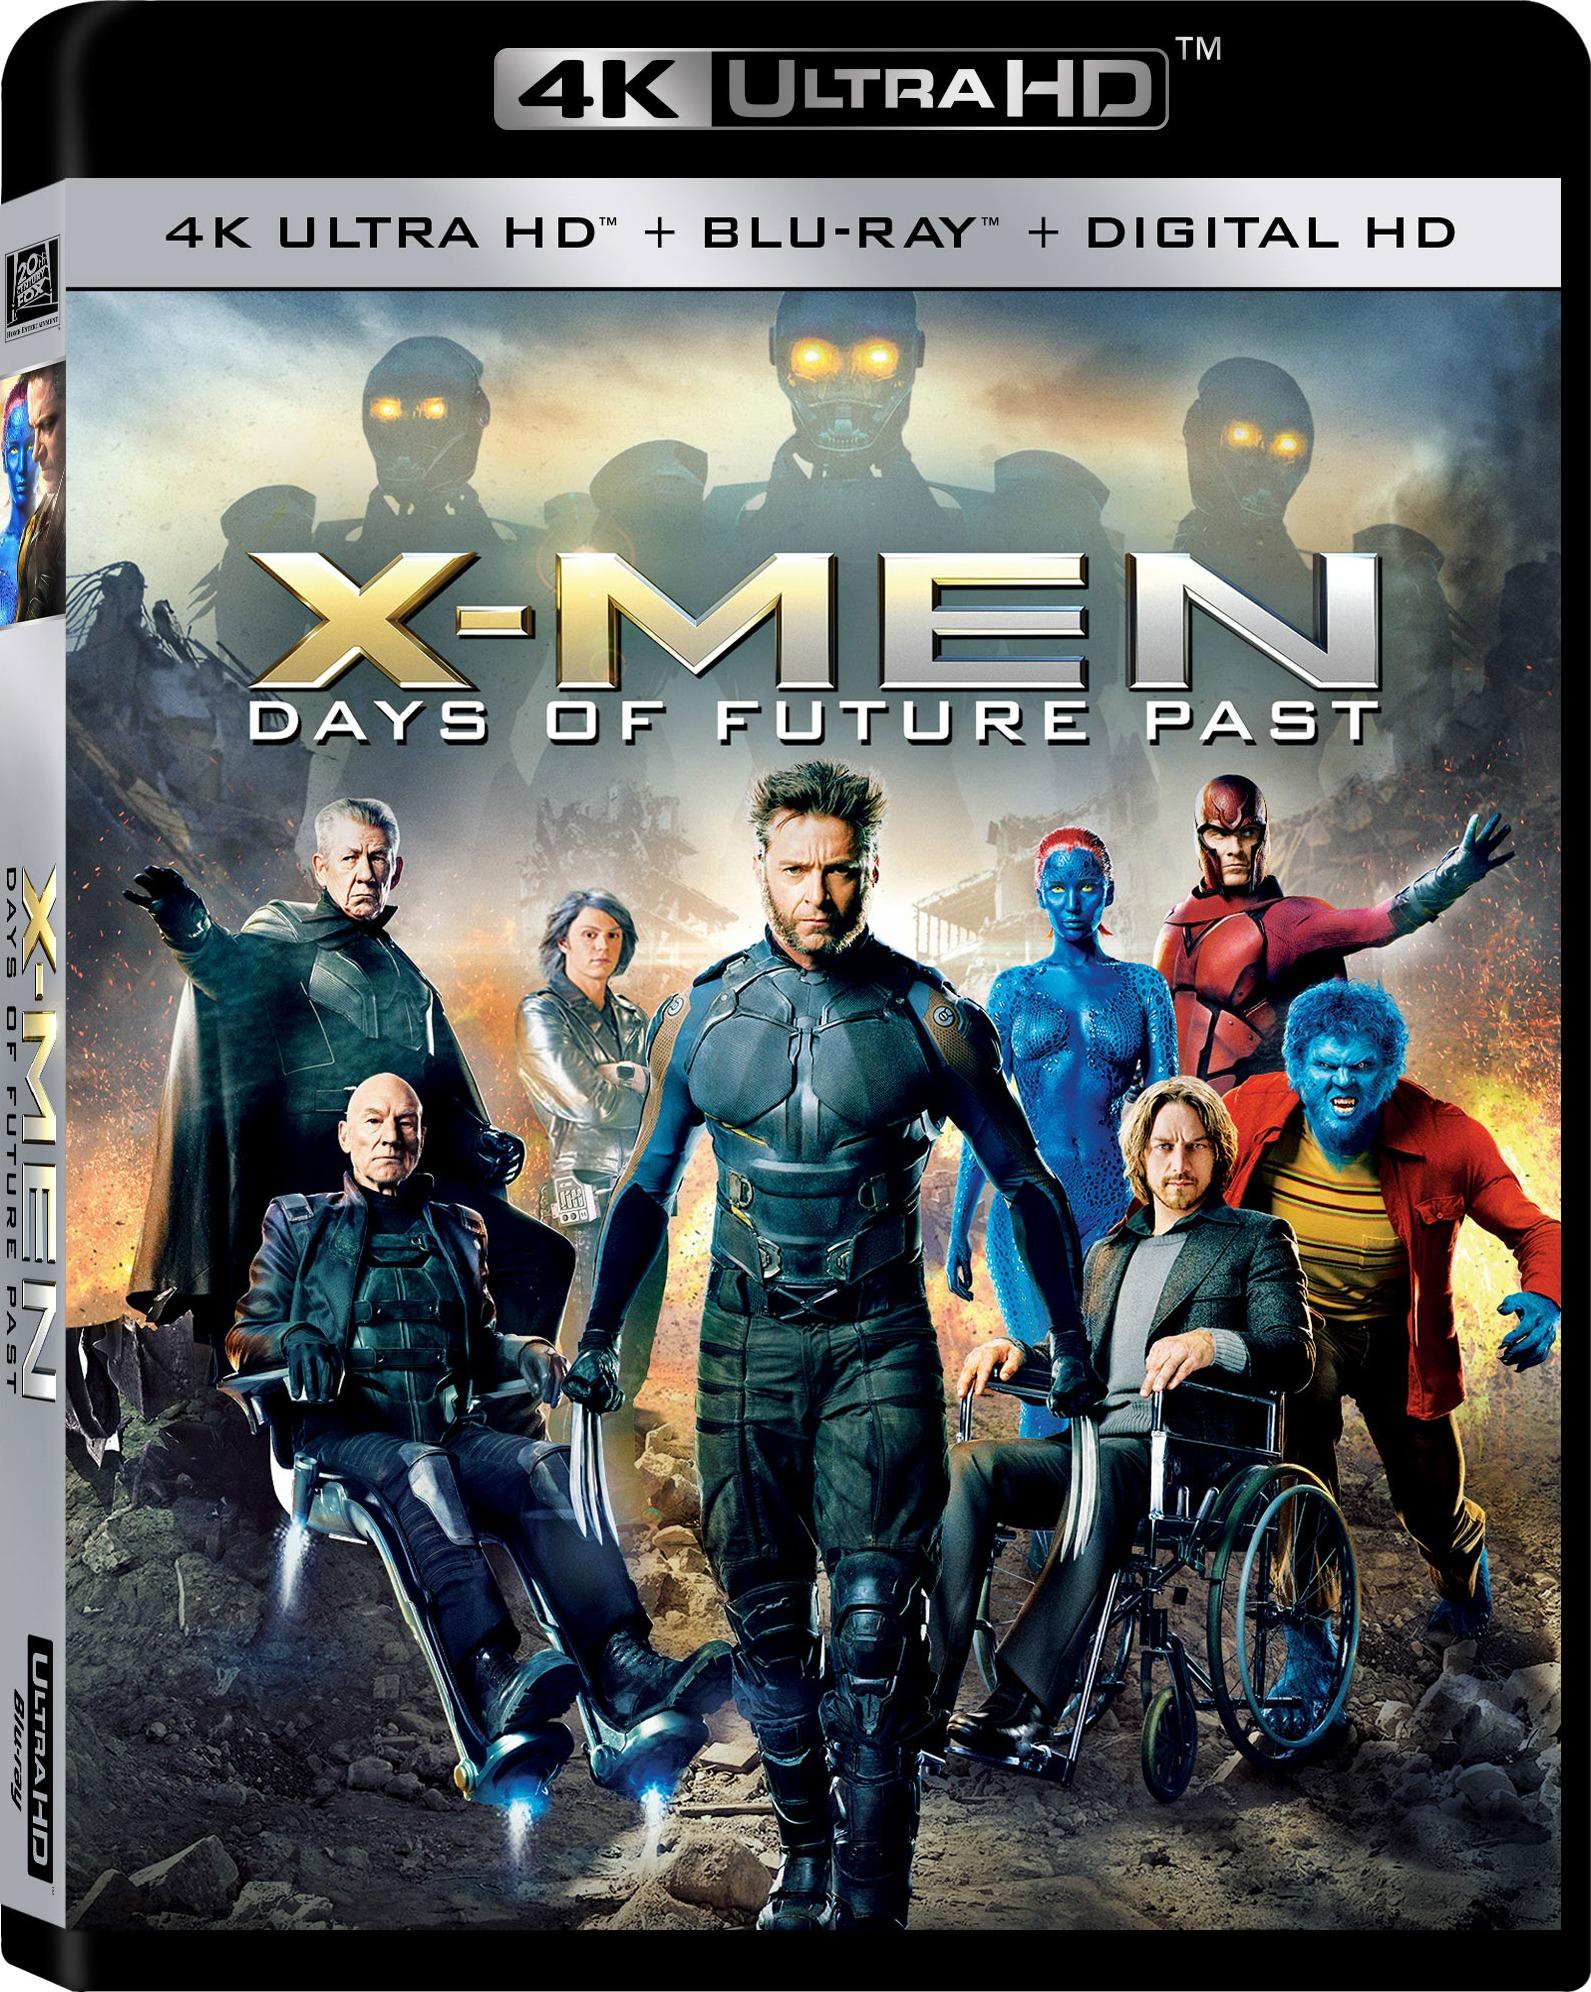 X-Men: Days of Future Past 4K (2014) 4K Ultra HD Blu-ray